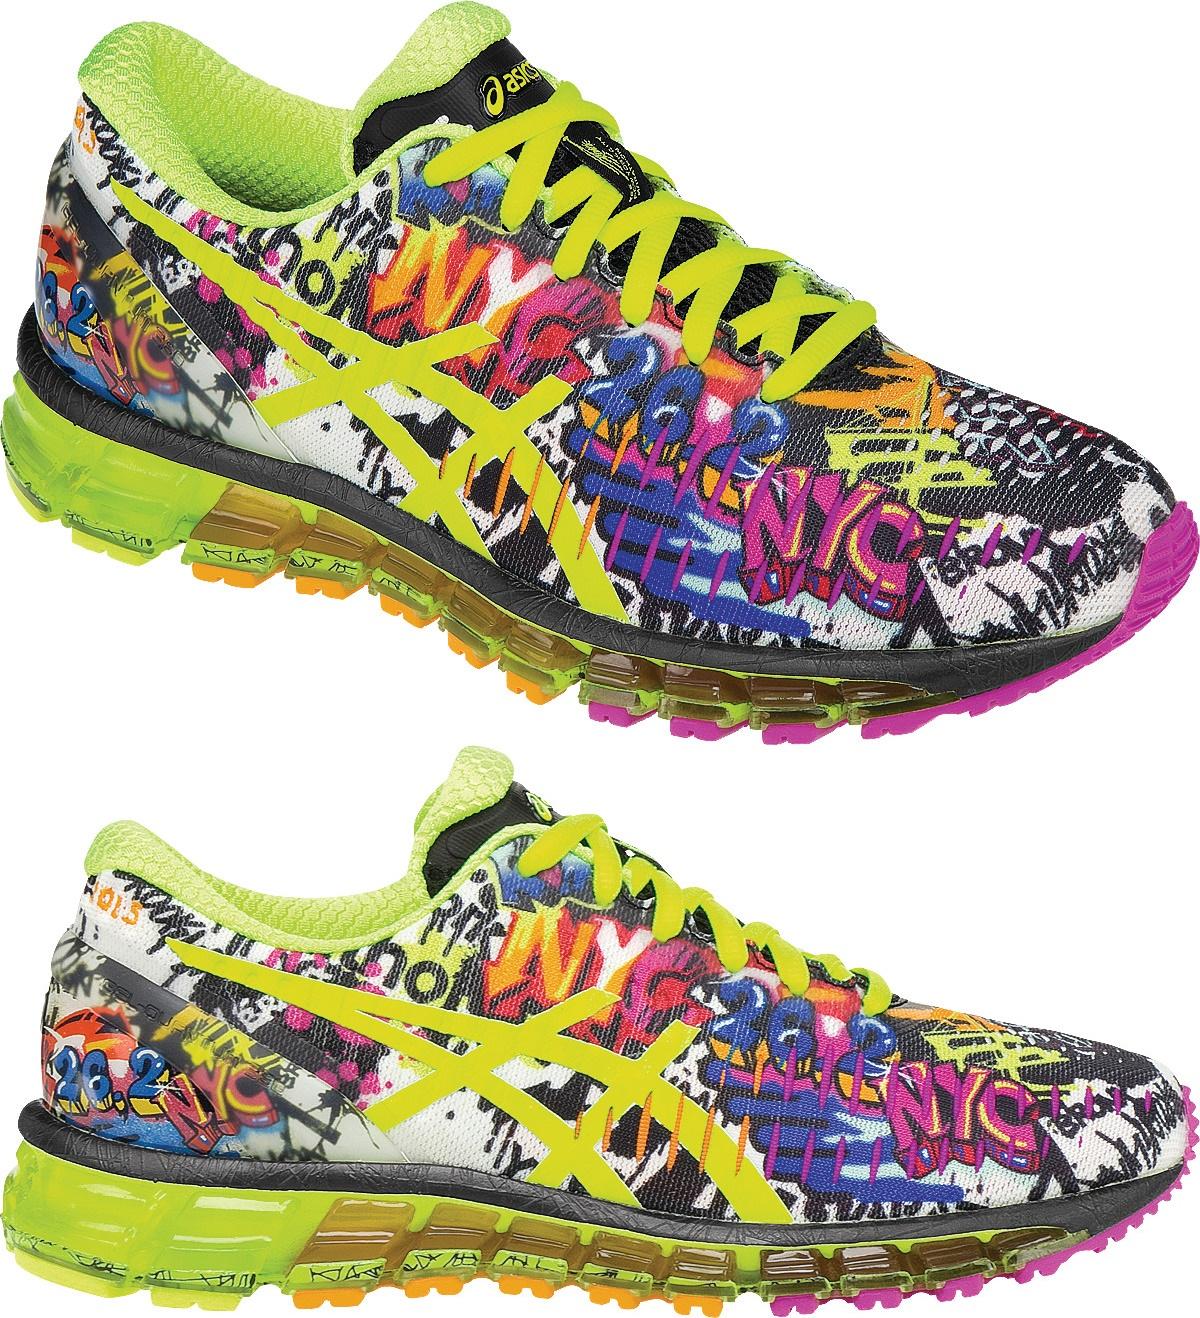 asics gel quantum 360 nyc men's shoes run new york